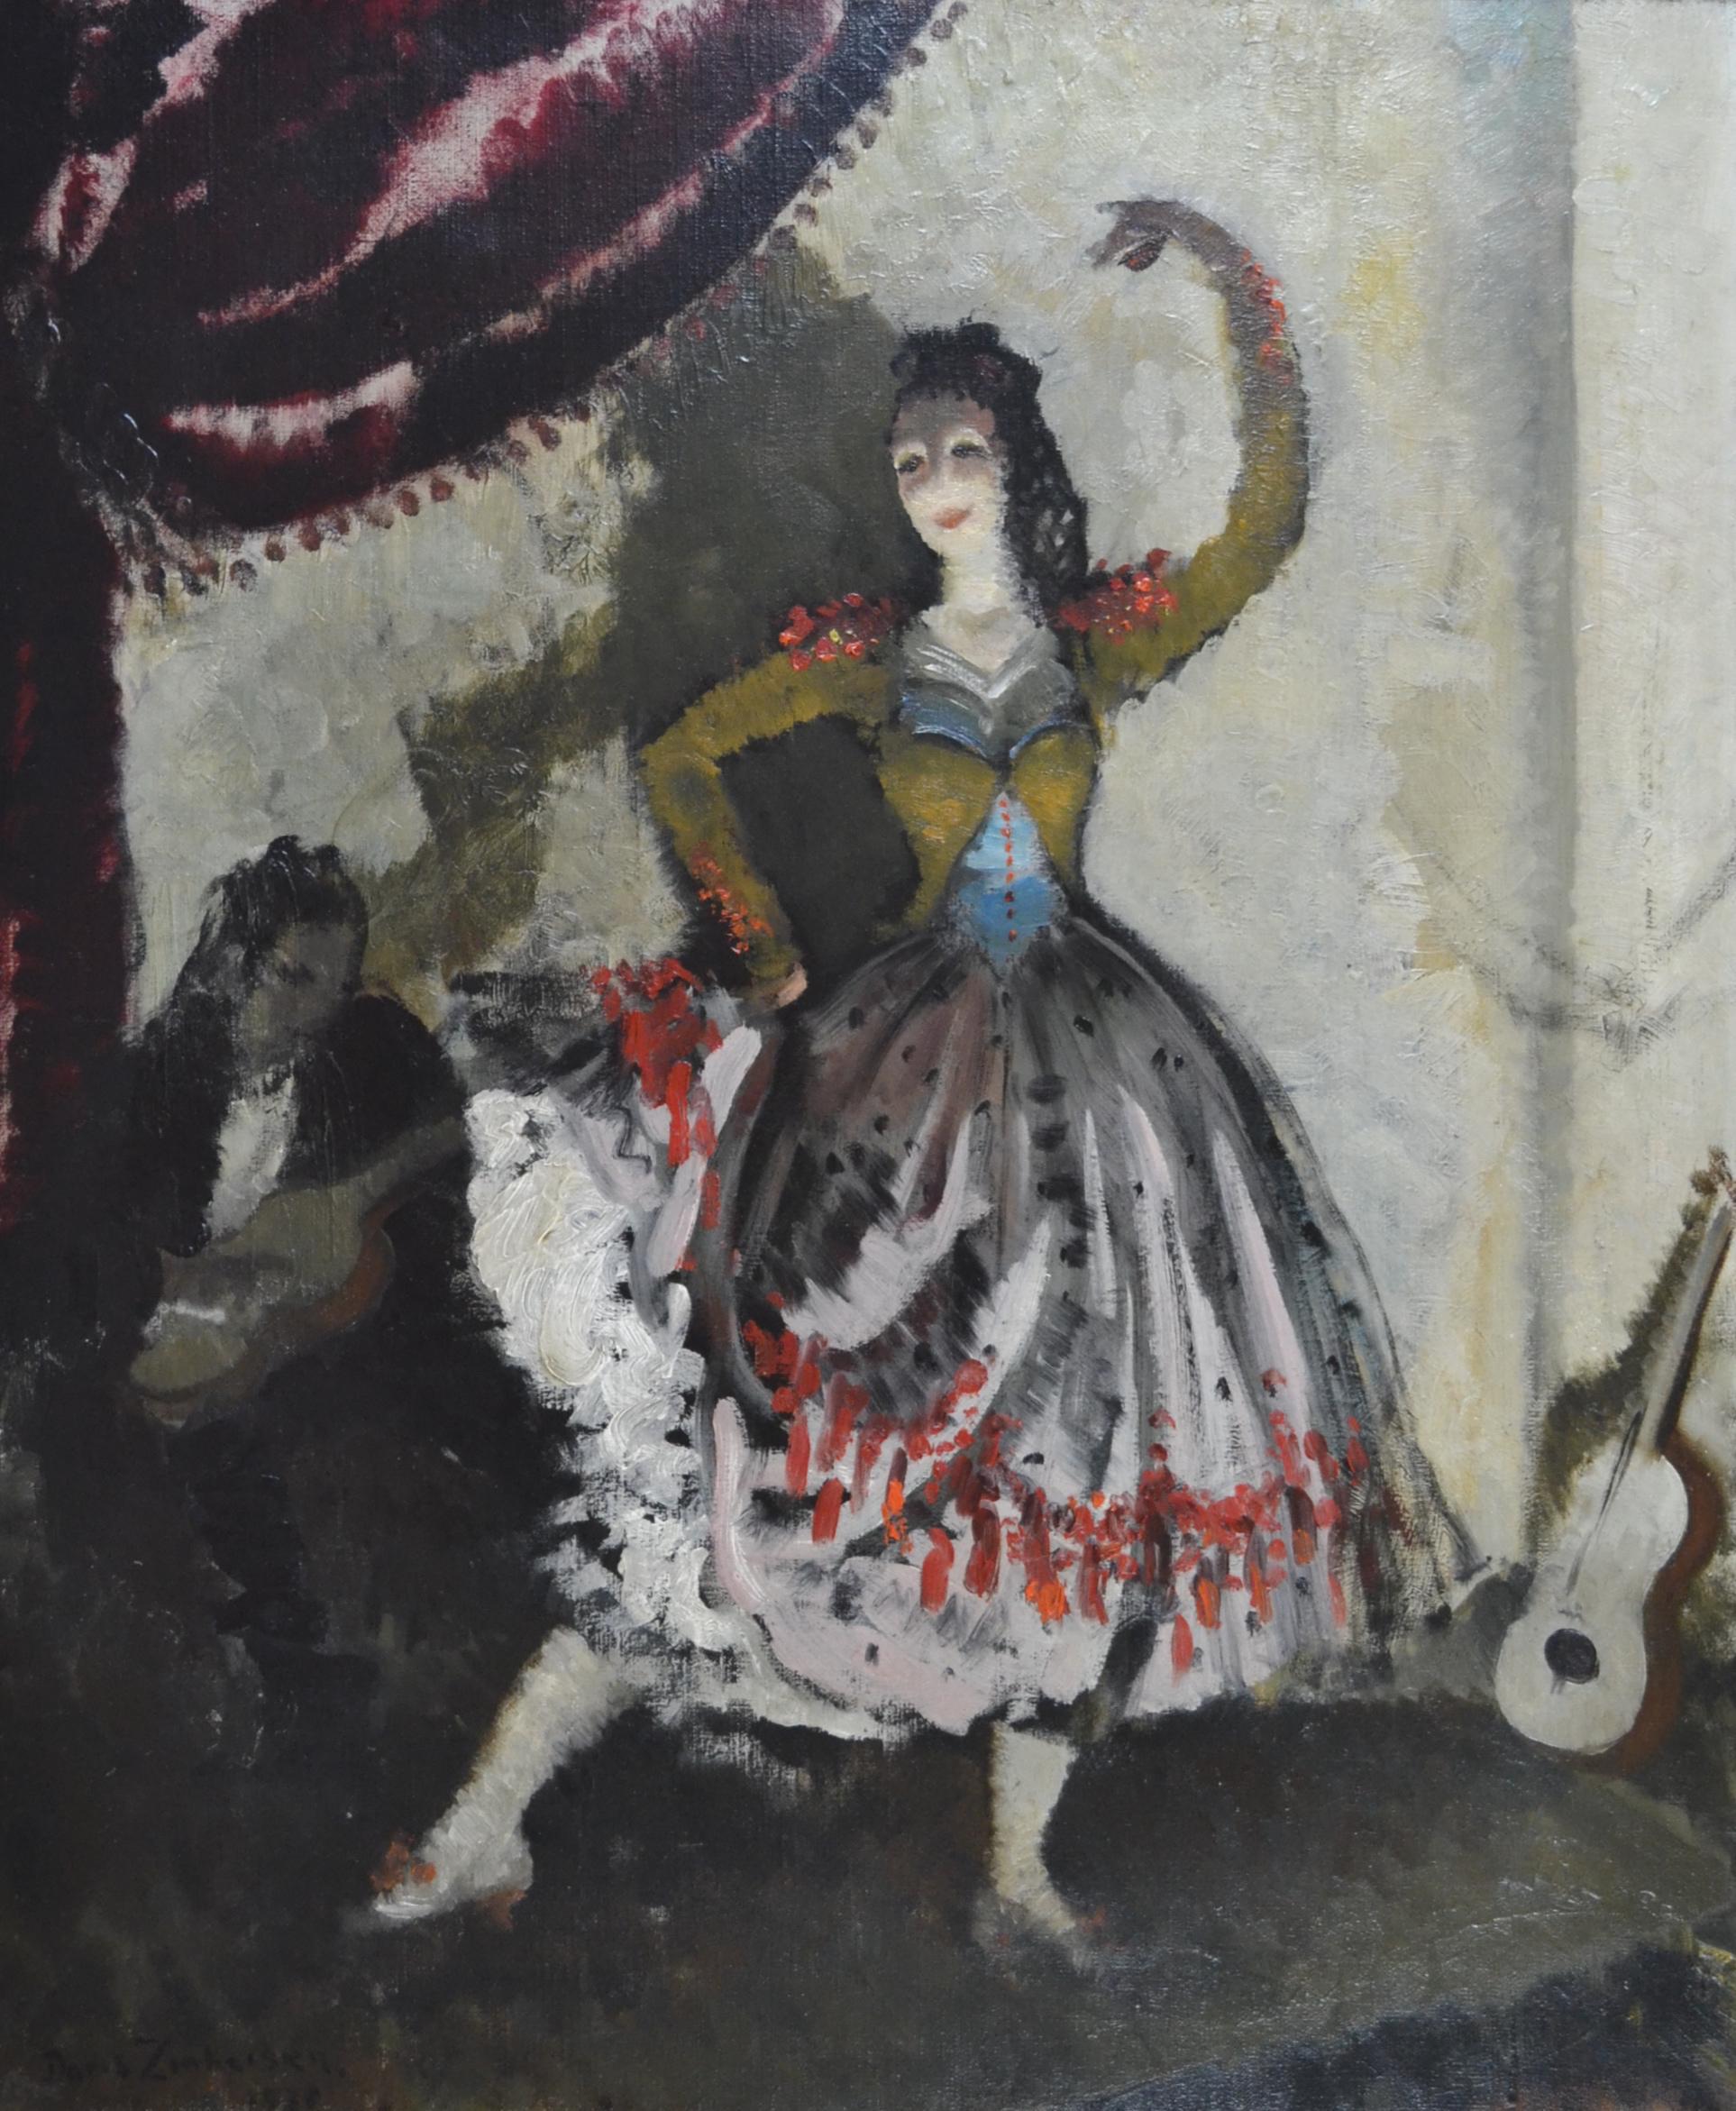 Flamenco Dancer - 1930s theatrical oil painting by Doris Zinkeisen